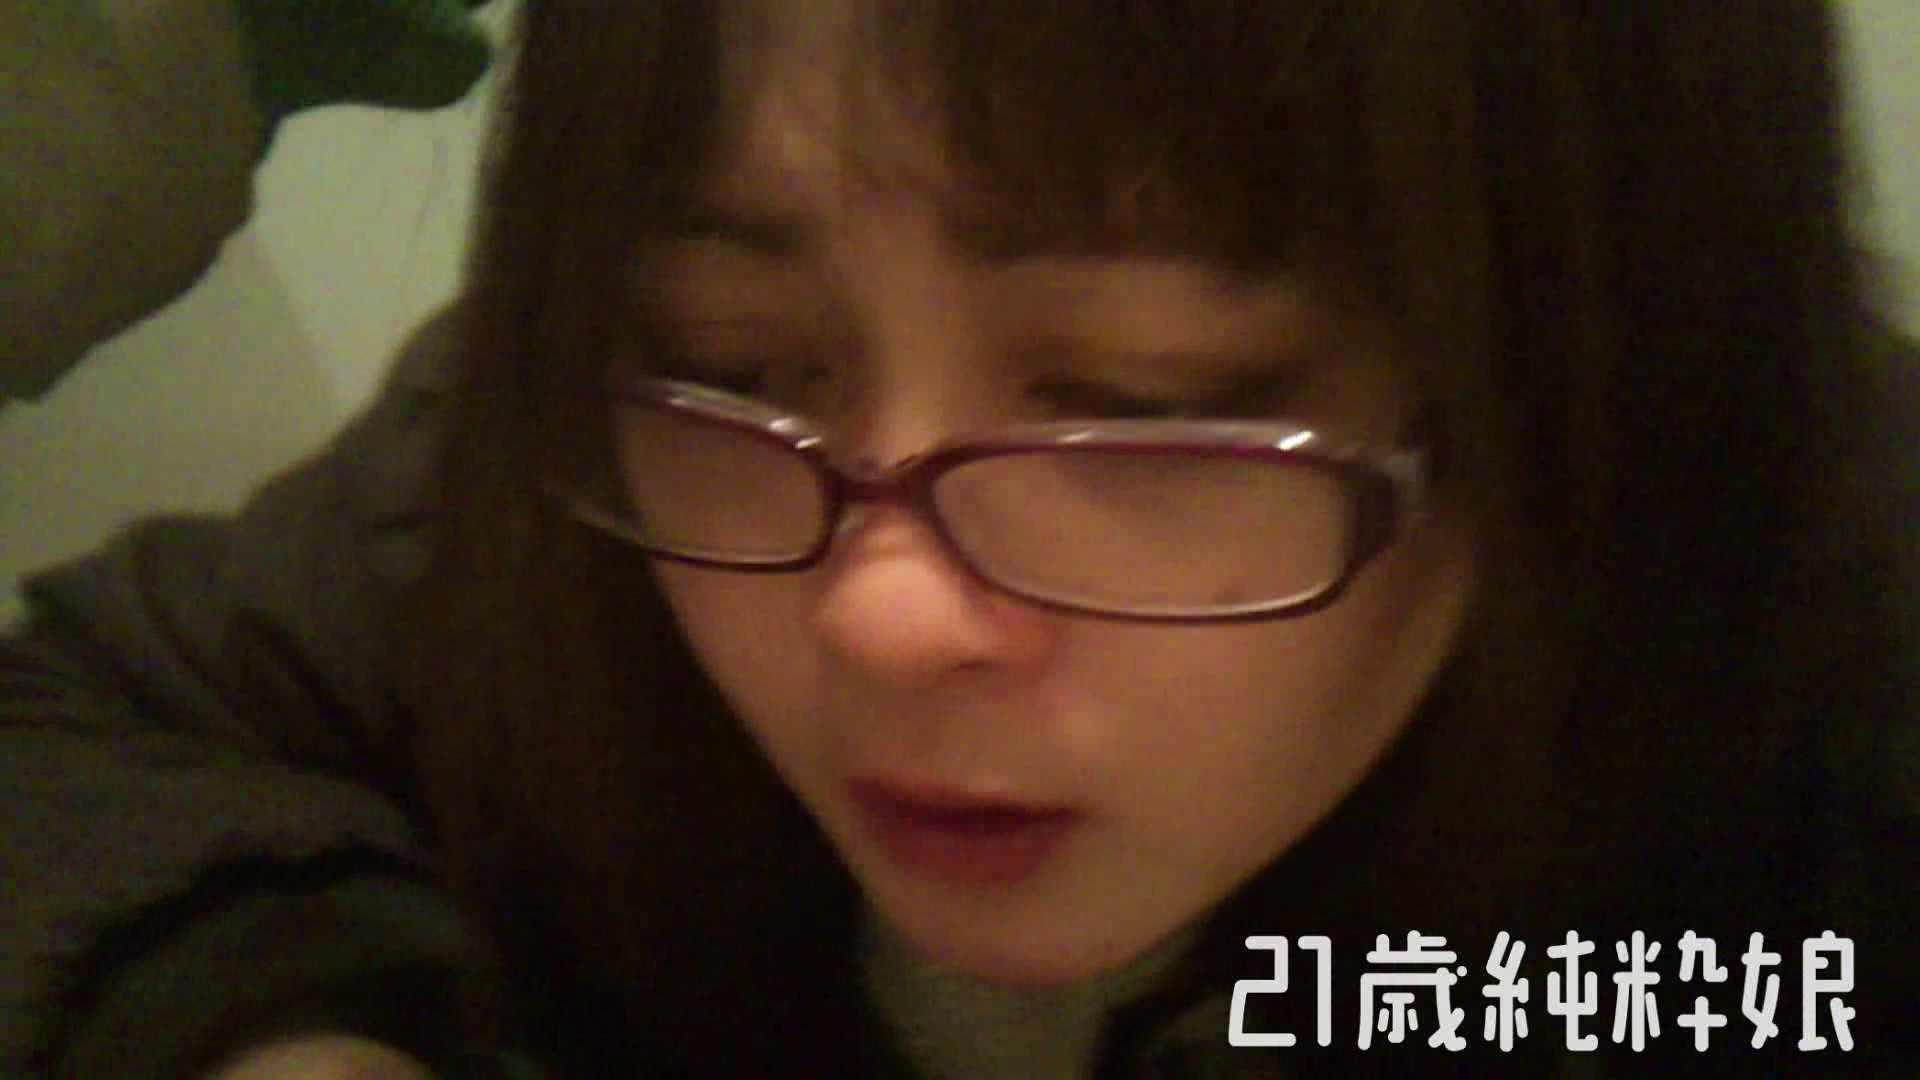 Gカップ21歳純粋嬢第2弾Vol.5 性欲丸出し | 学校  101pic 59